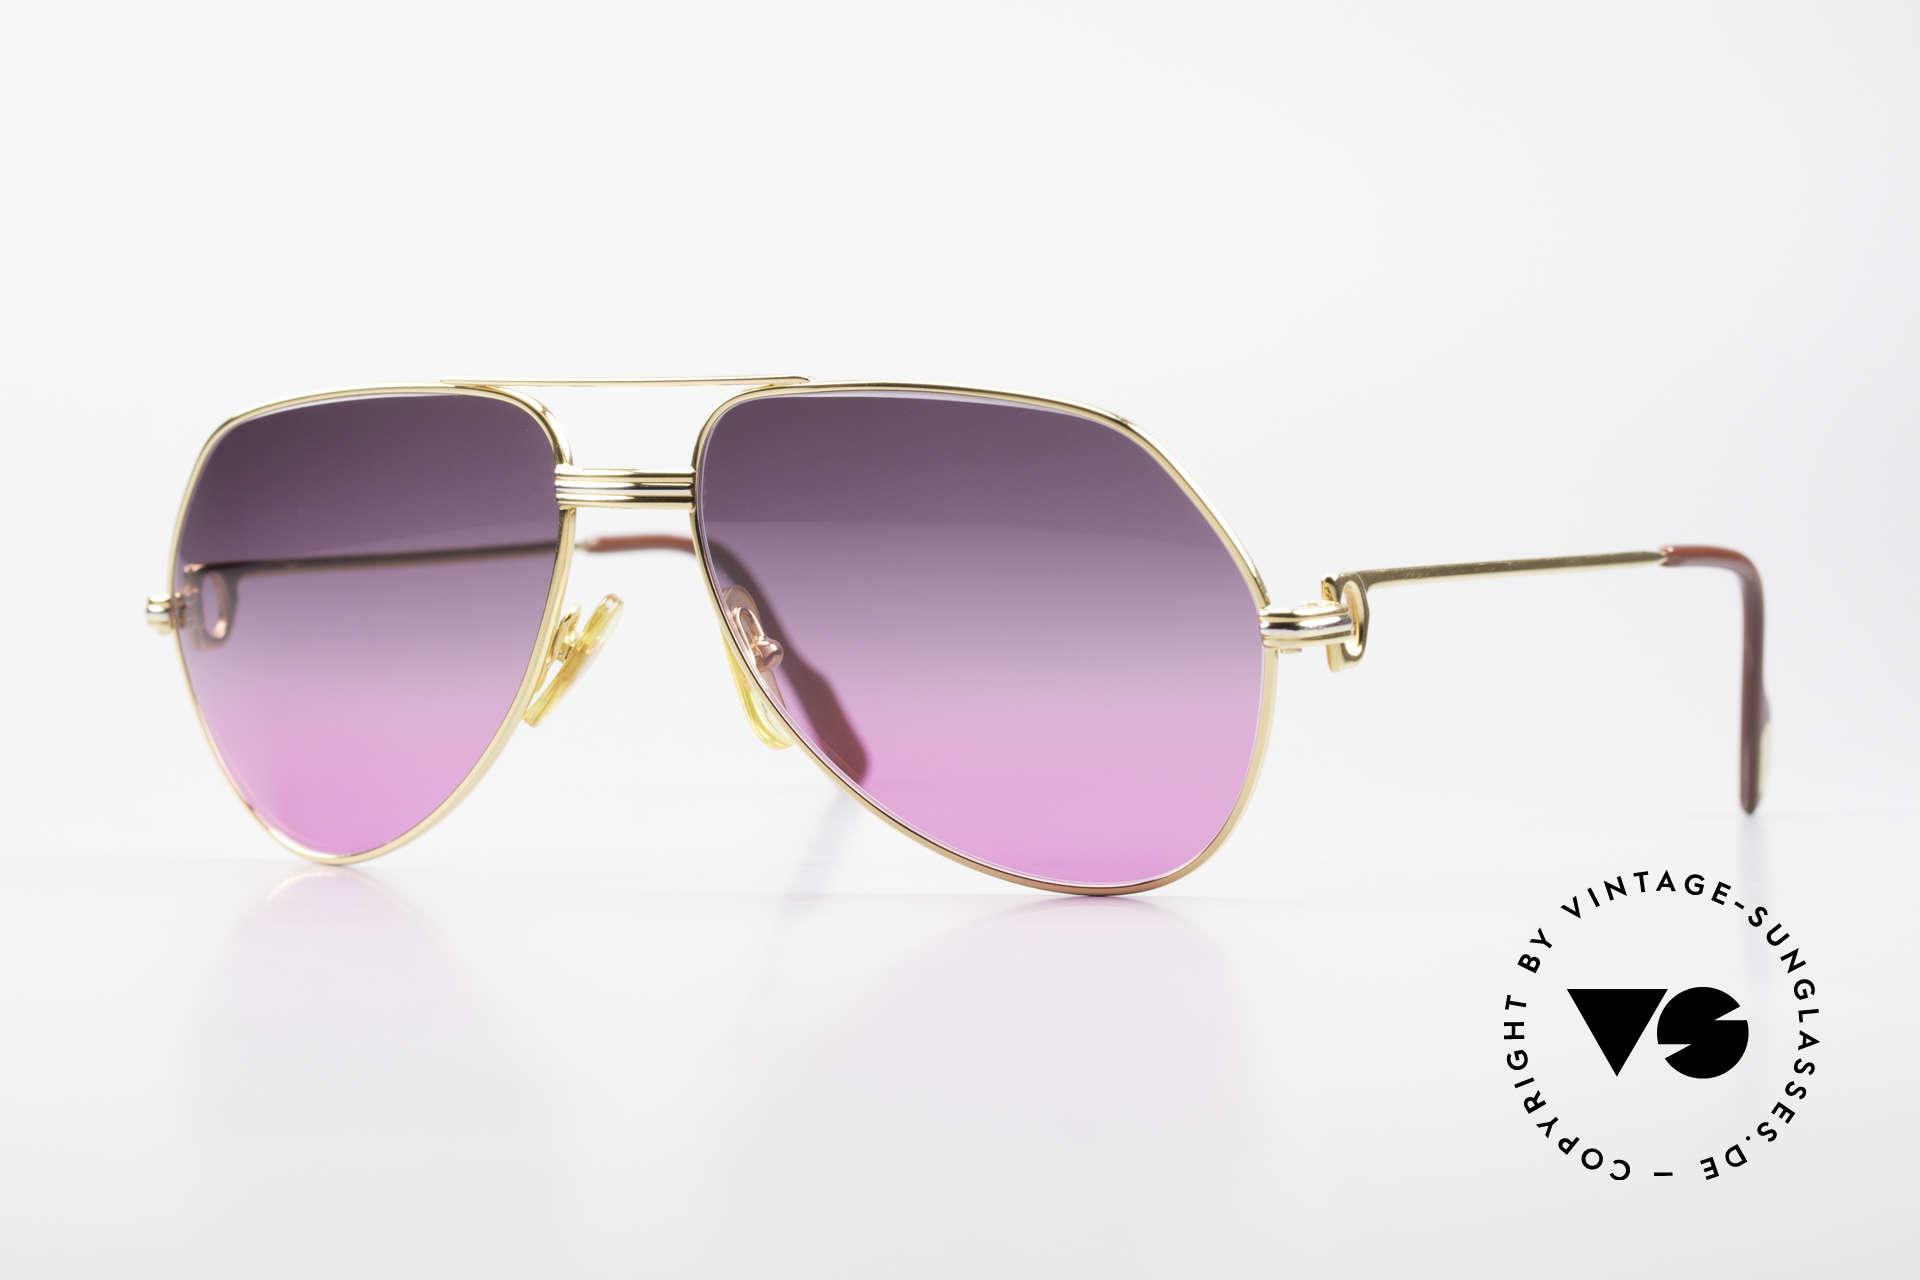 Cartier Vendome LC - M 80's Sunglasses Aviator Luxury, Cartier Vendome vintage glasses, famous aviator style, Made for Men and Women